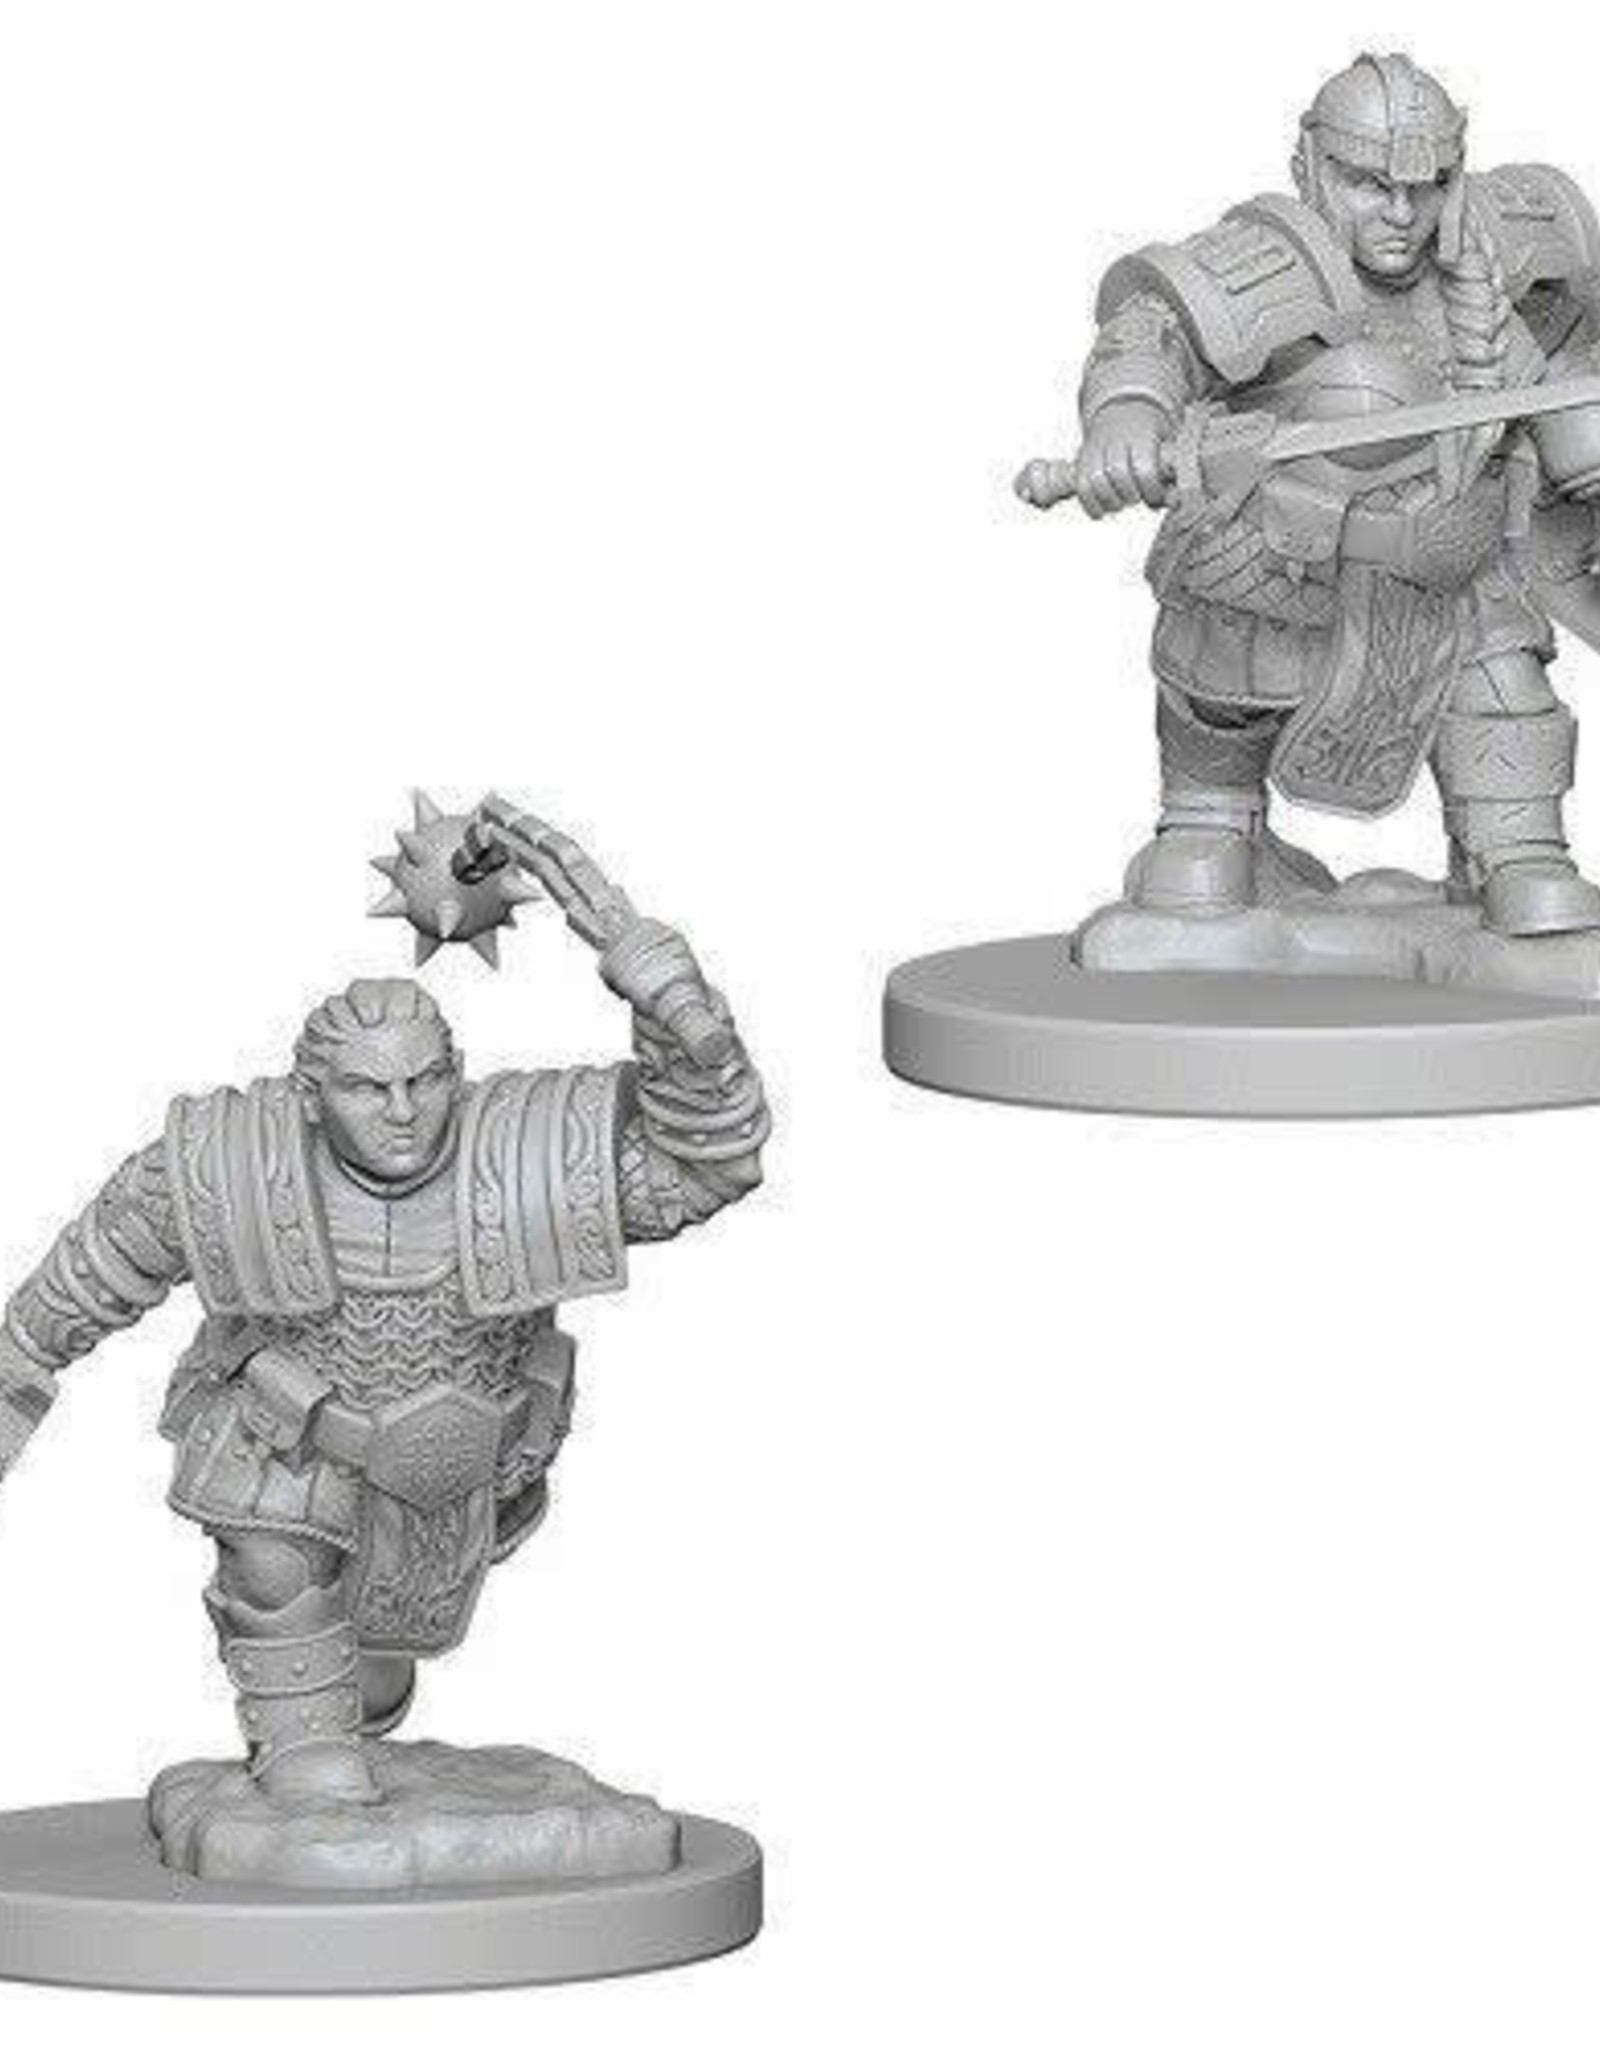 WizKids D&D Nolzur Dwarf Fighter (She/Her/They/Them)